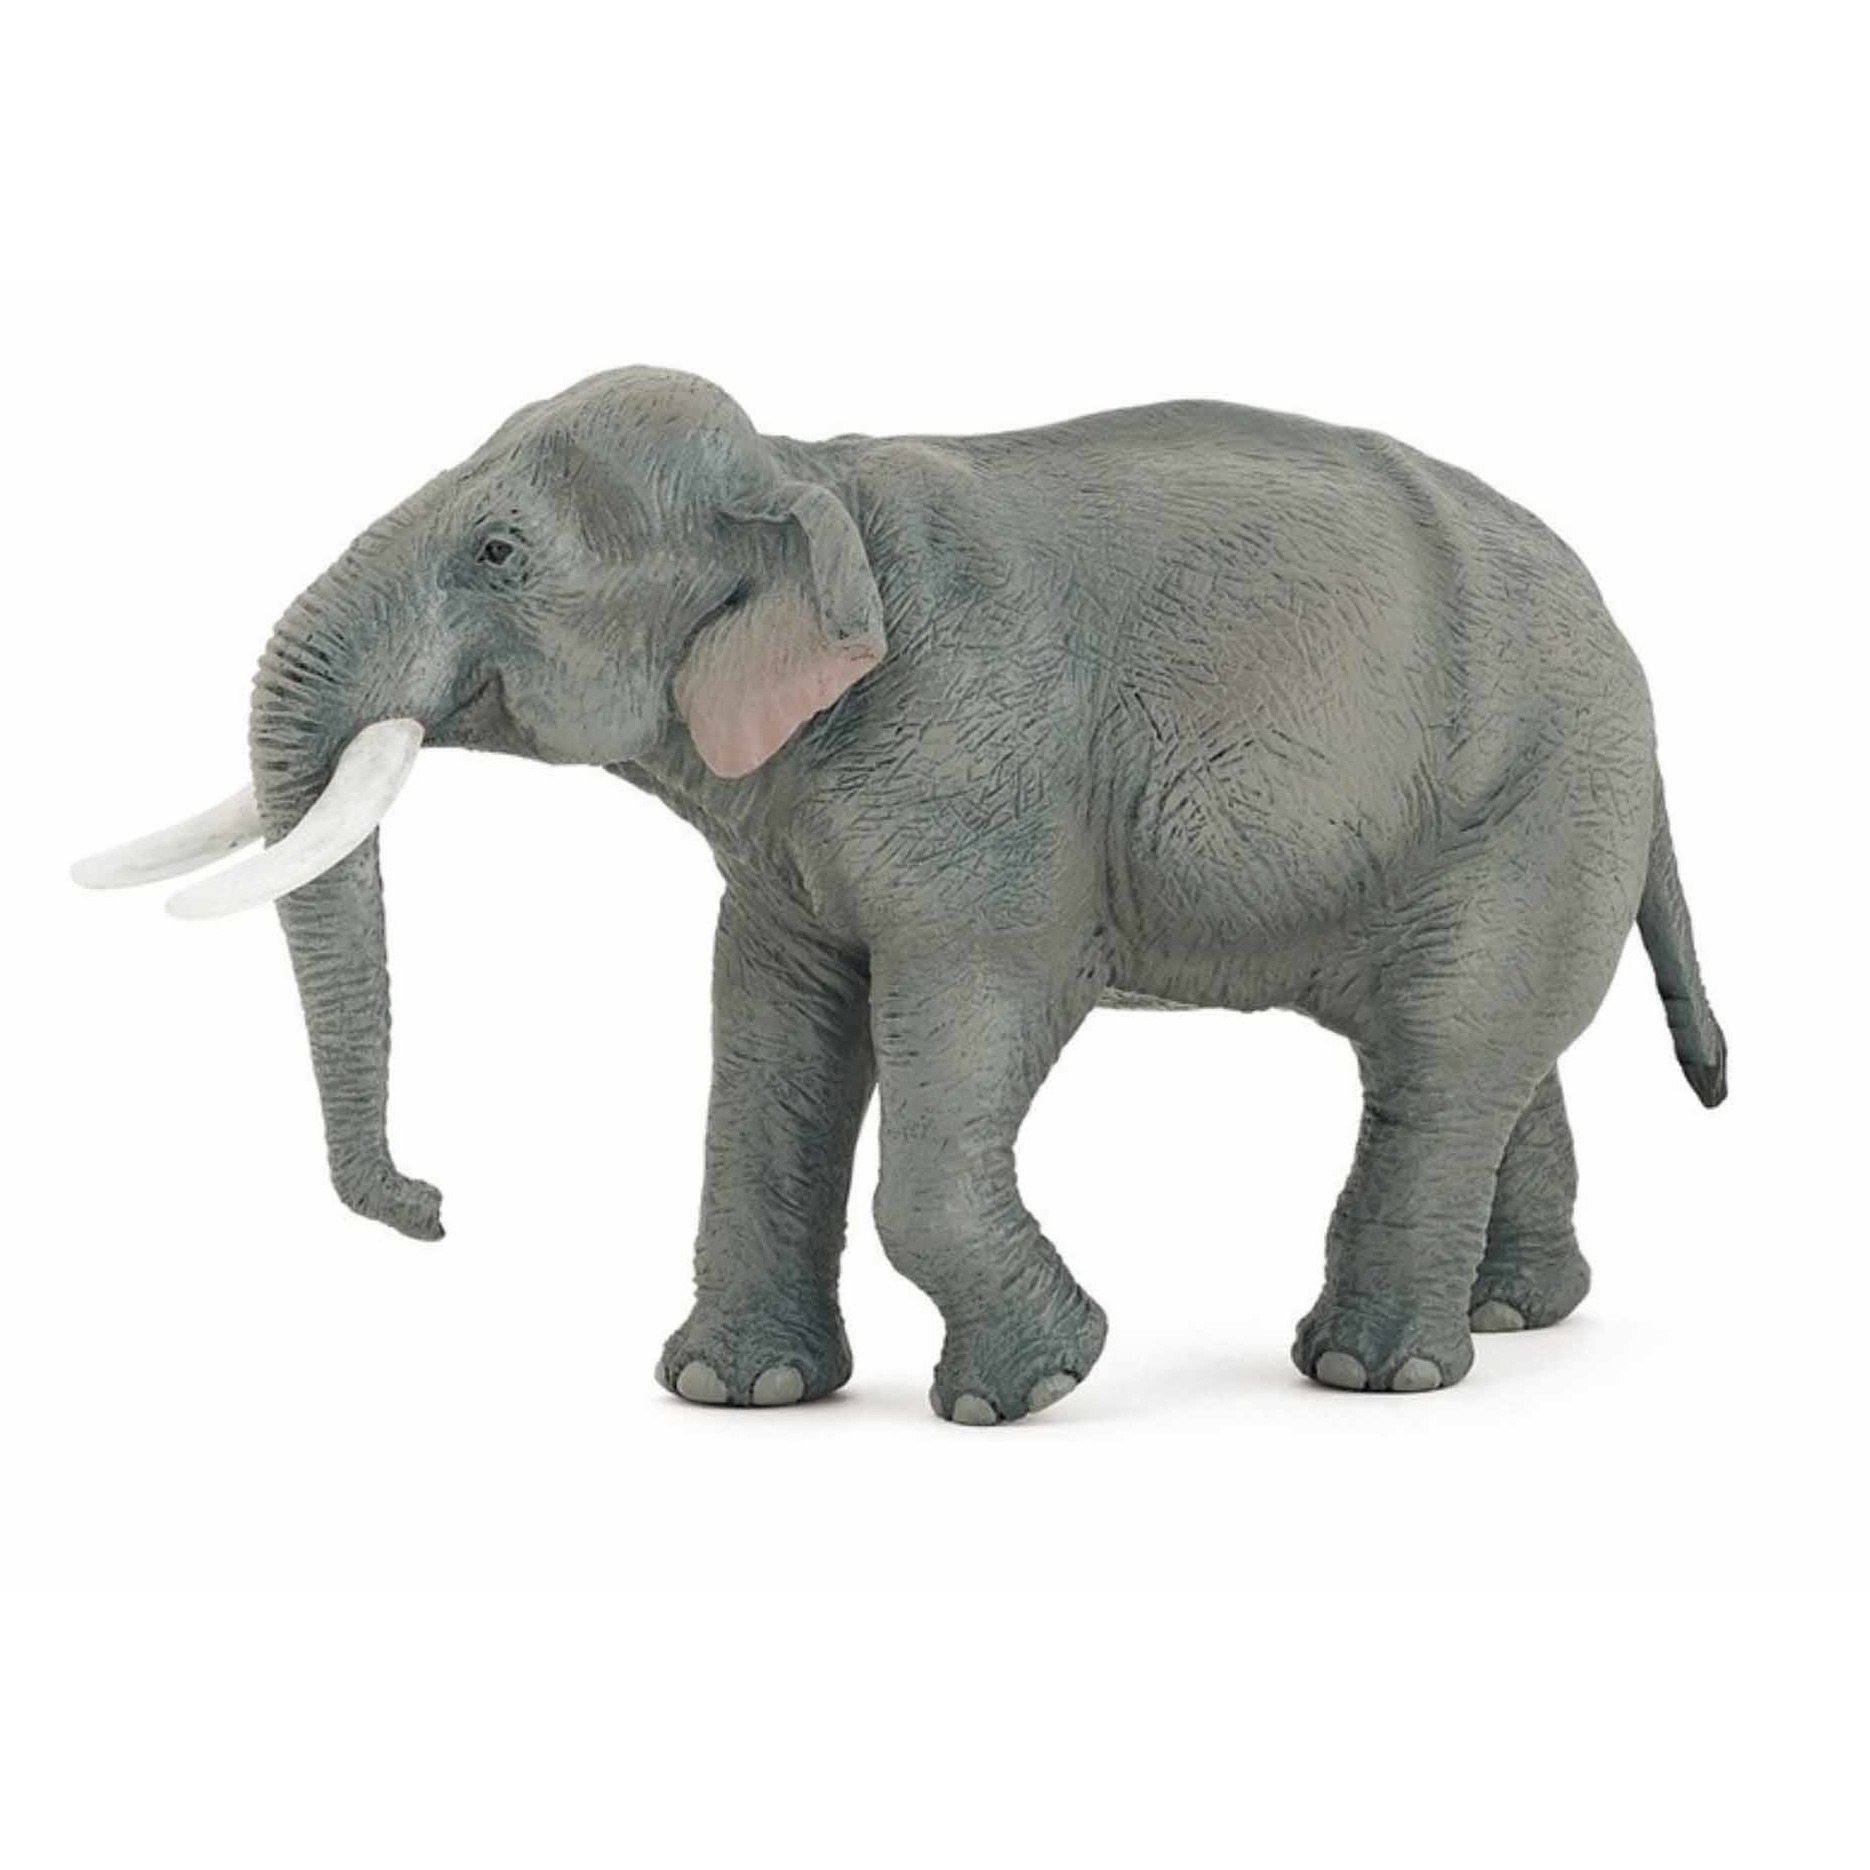 Plastic Aziatische moeder olifant 14.5 cm